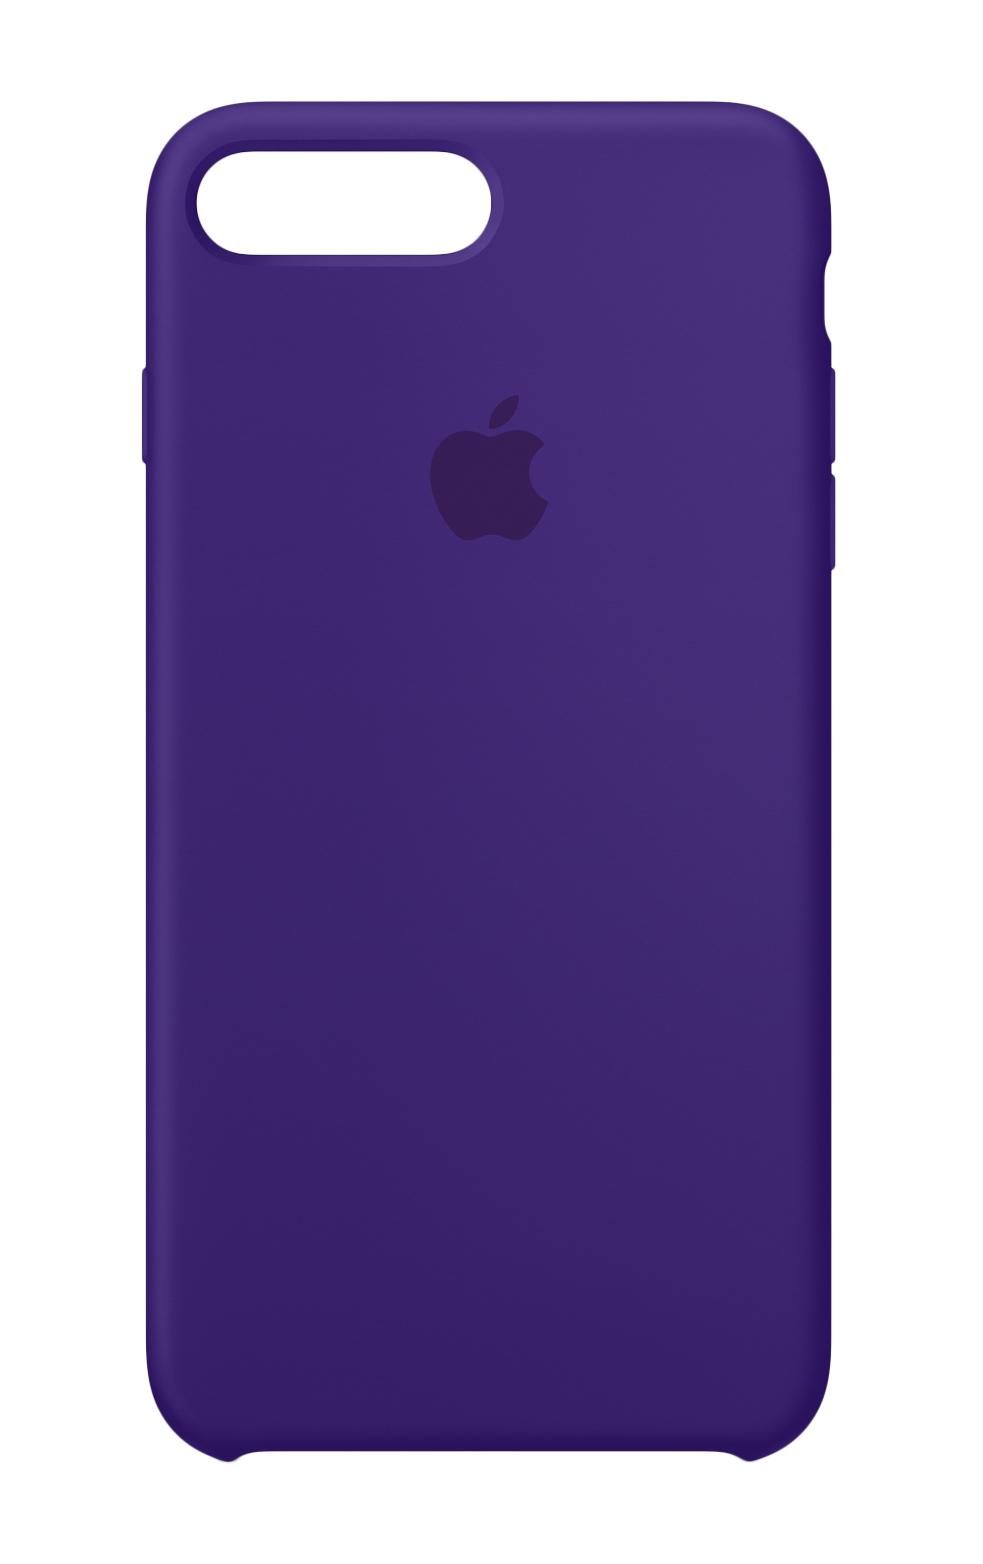 low priced 5b5de 2ed44 Apple MQH42ZM/A mobile phone case 14 cm (5.5